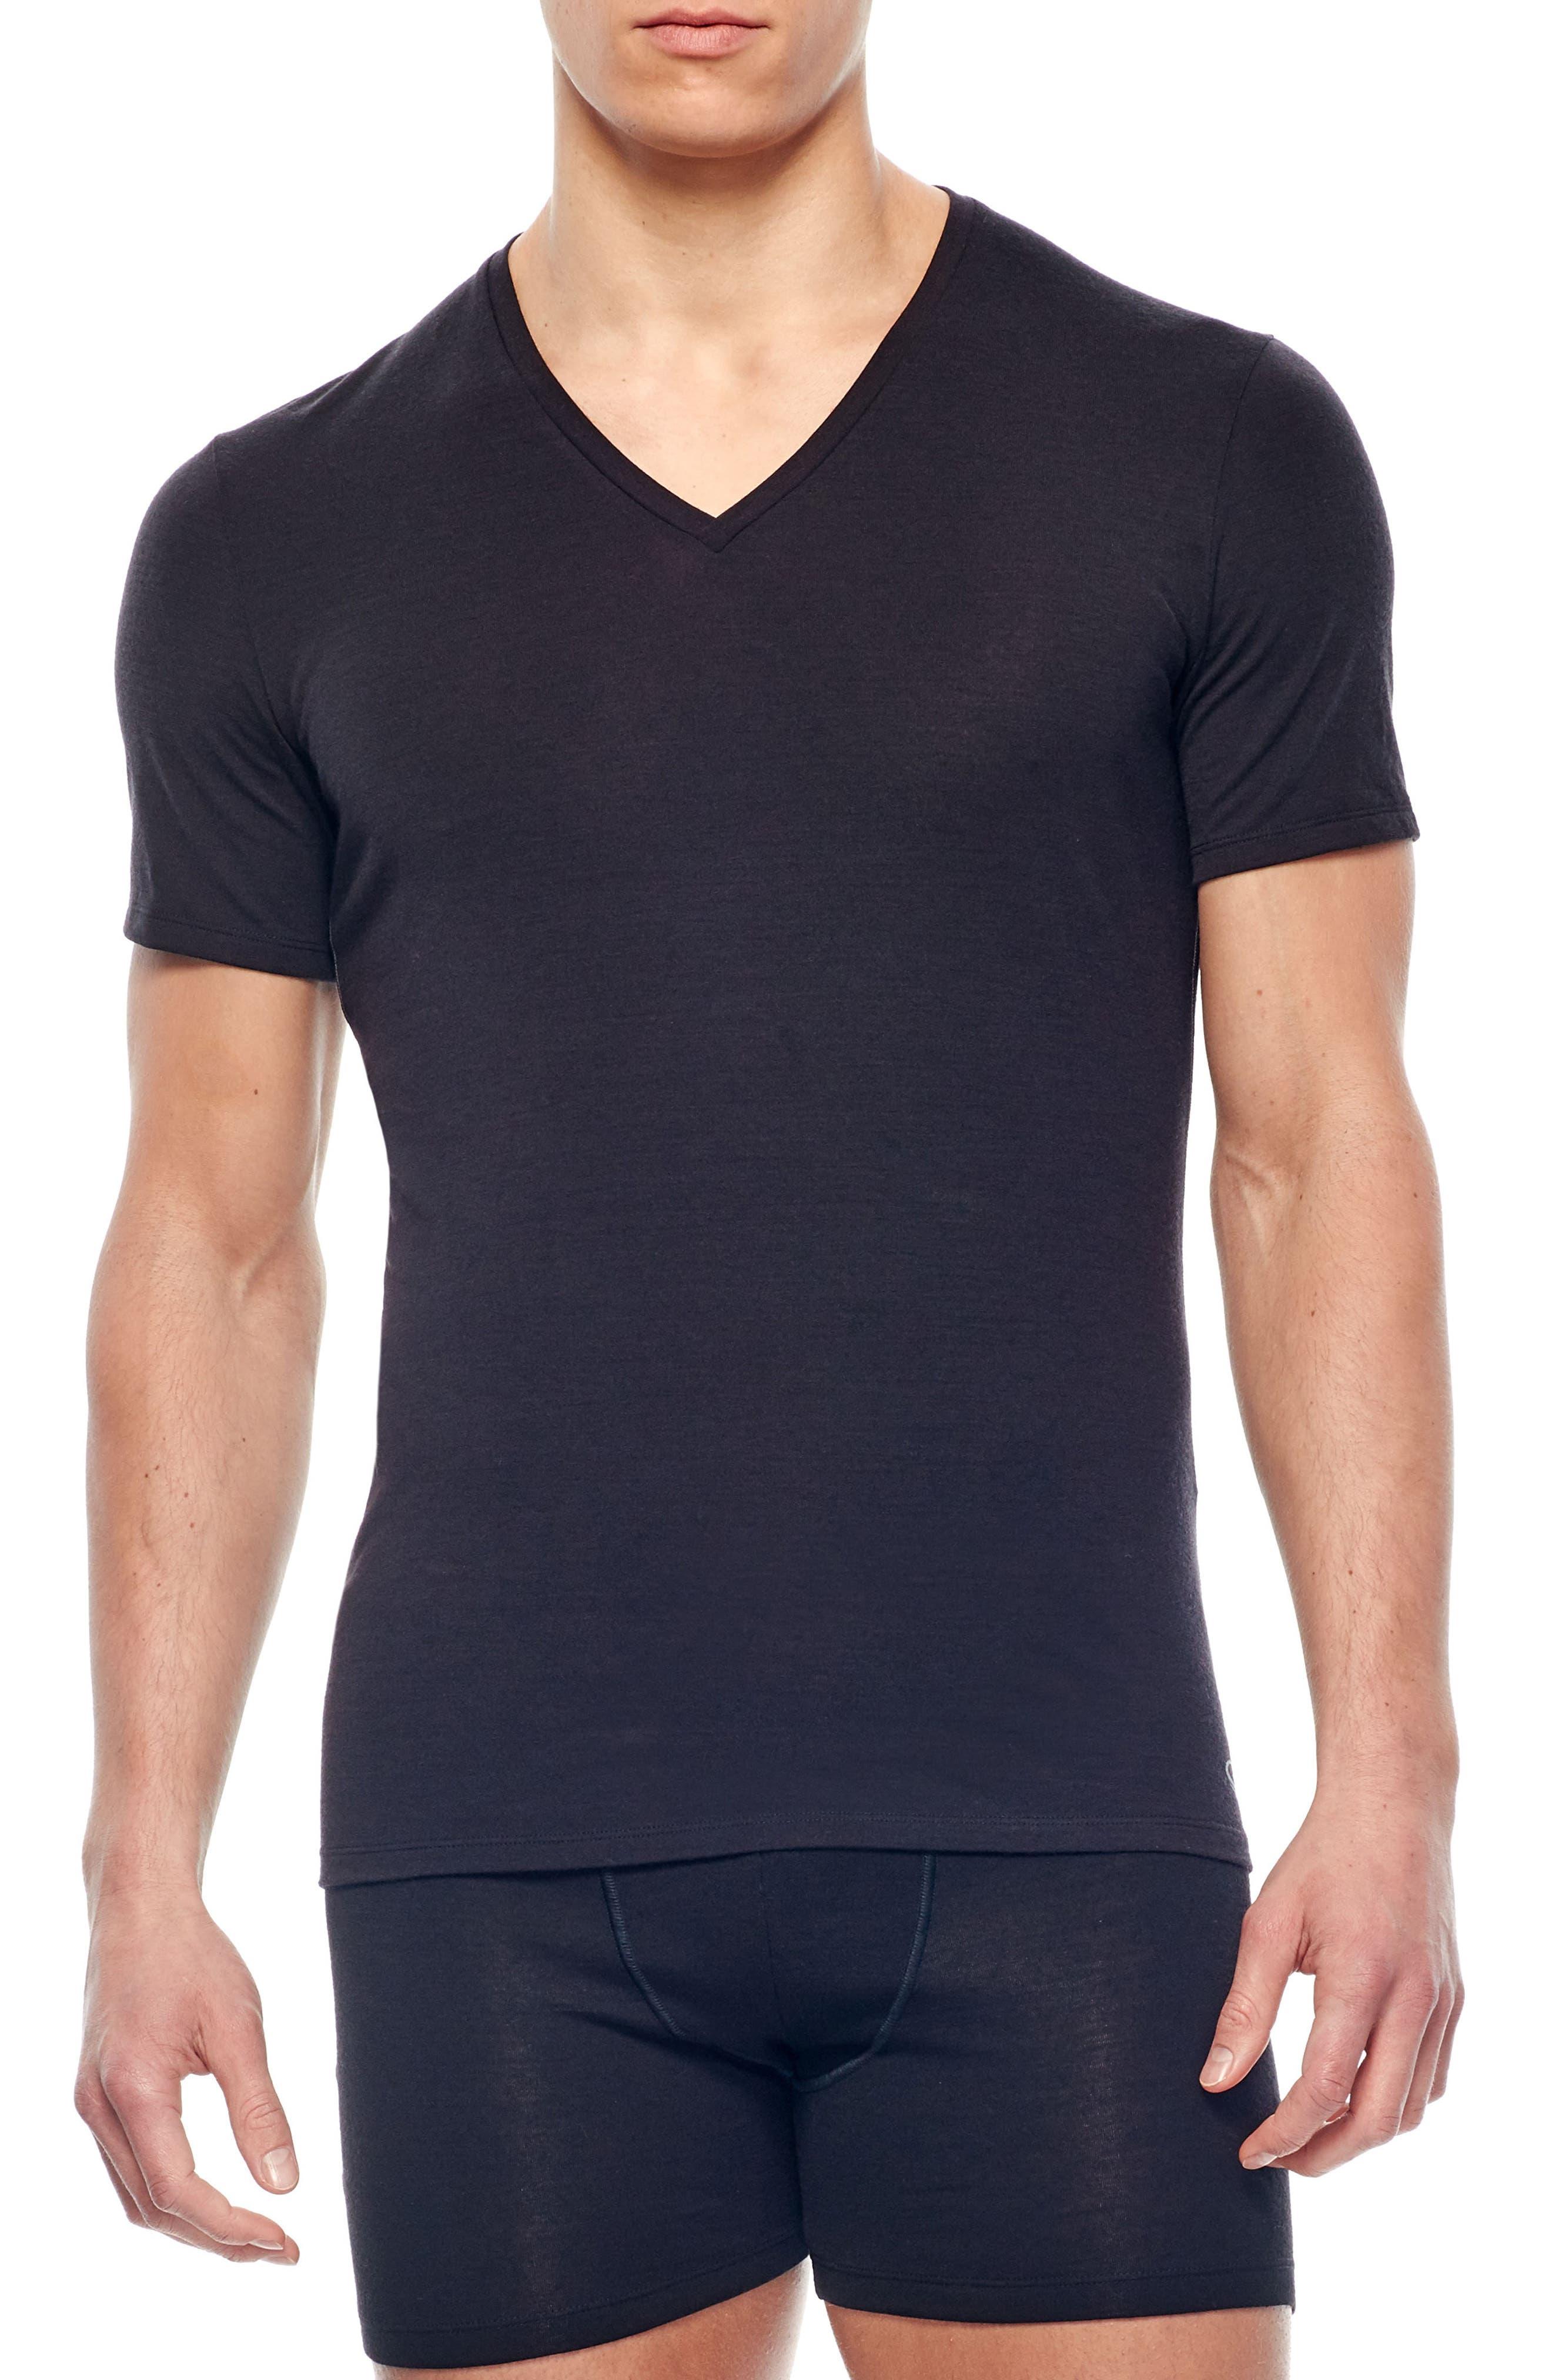 Anatomica Short Sleeve V-Neck T-Shirt